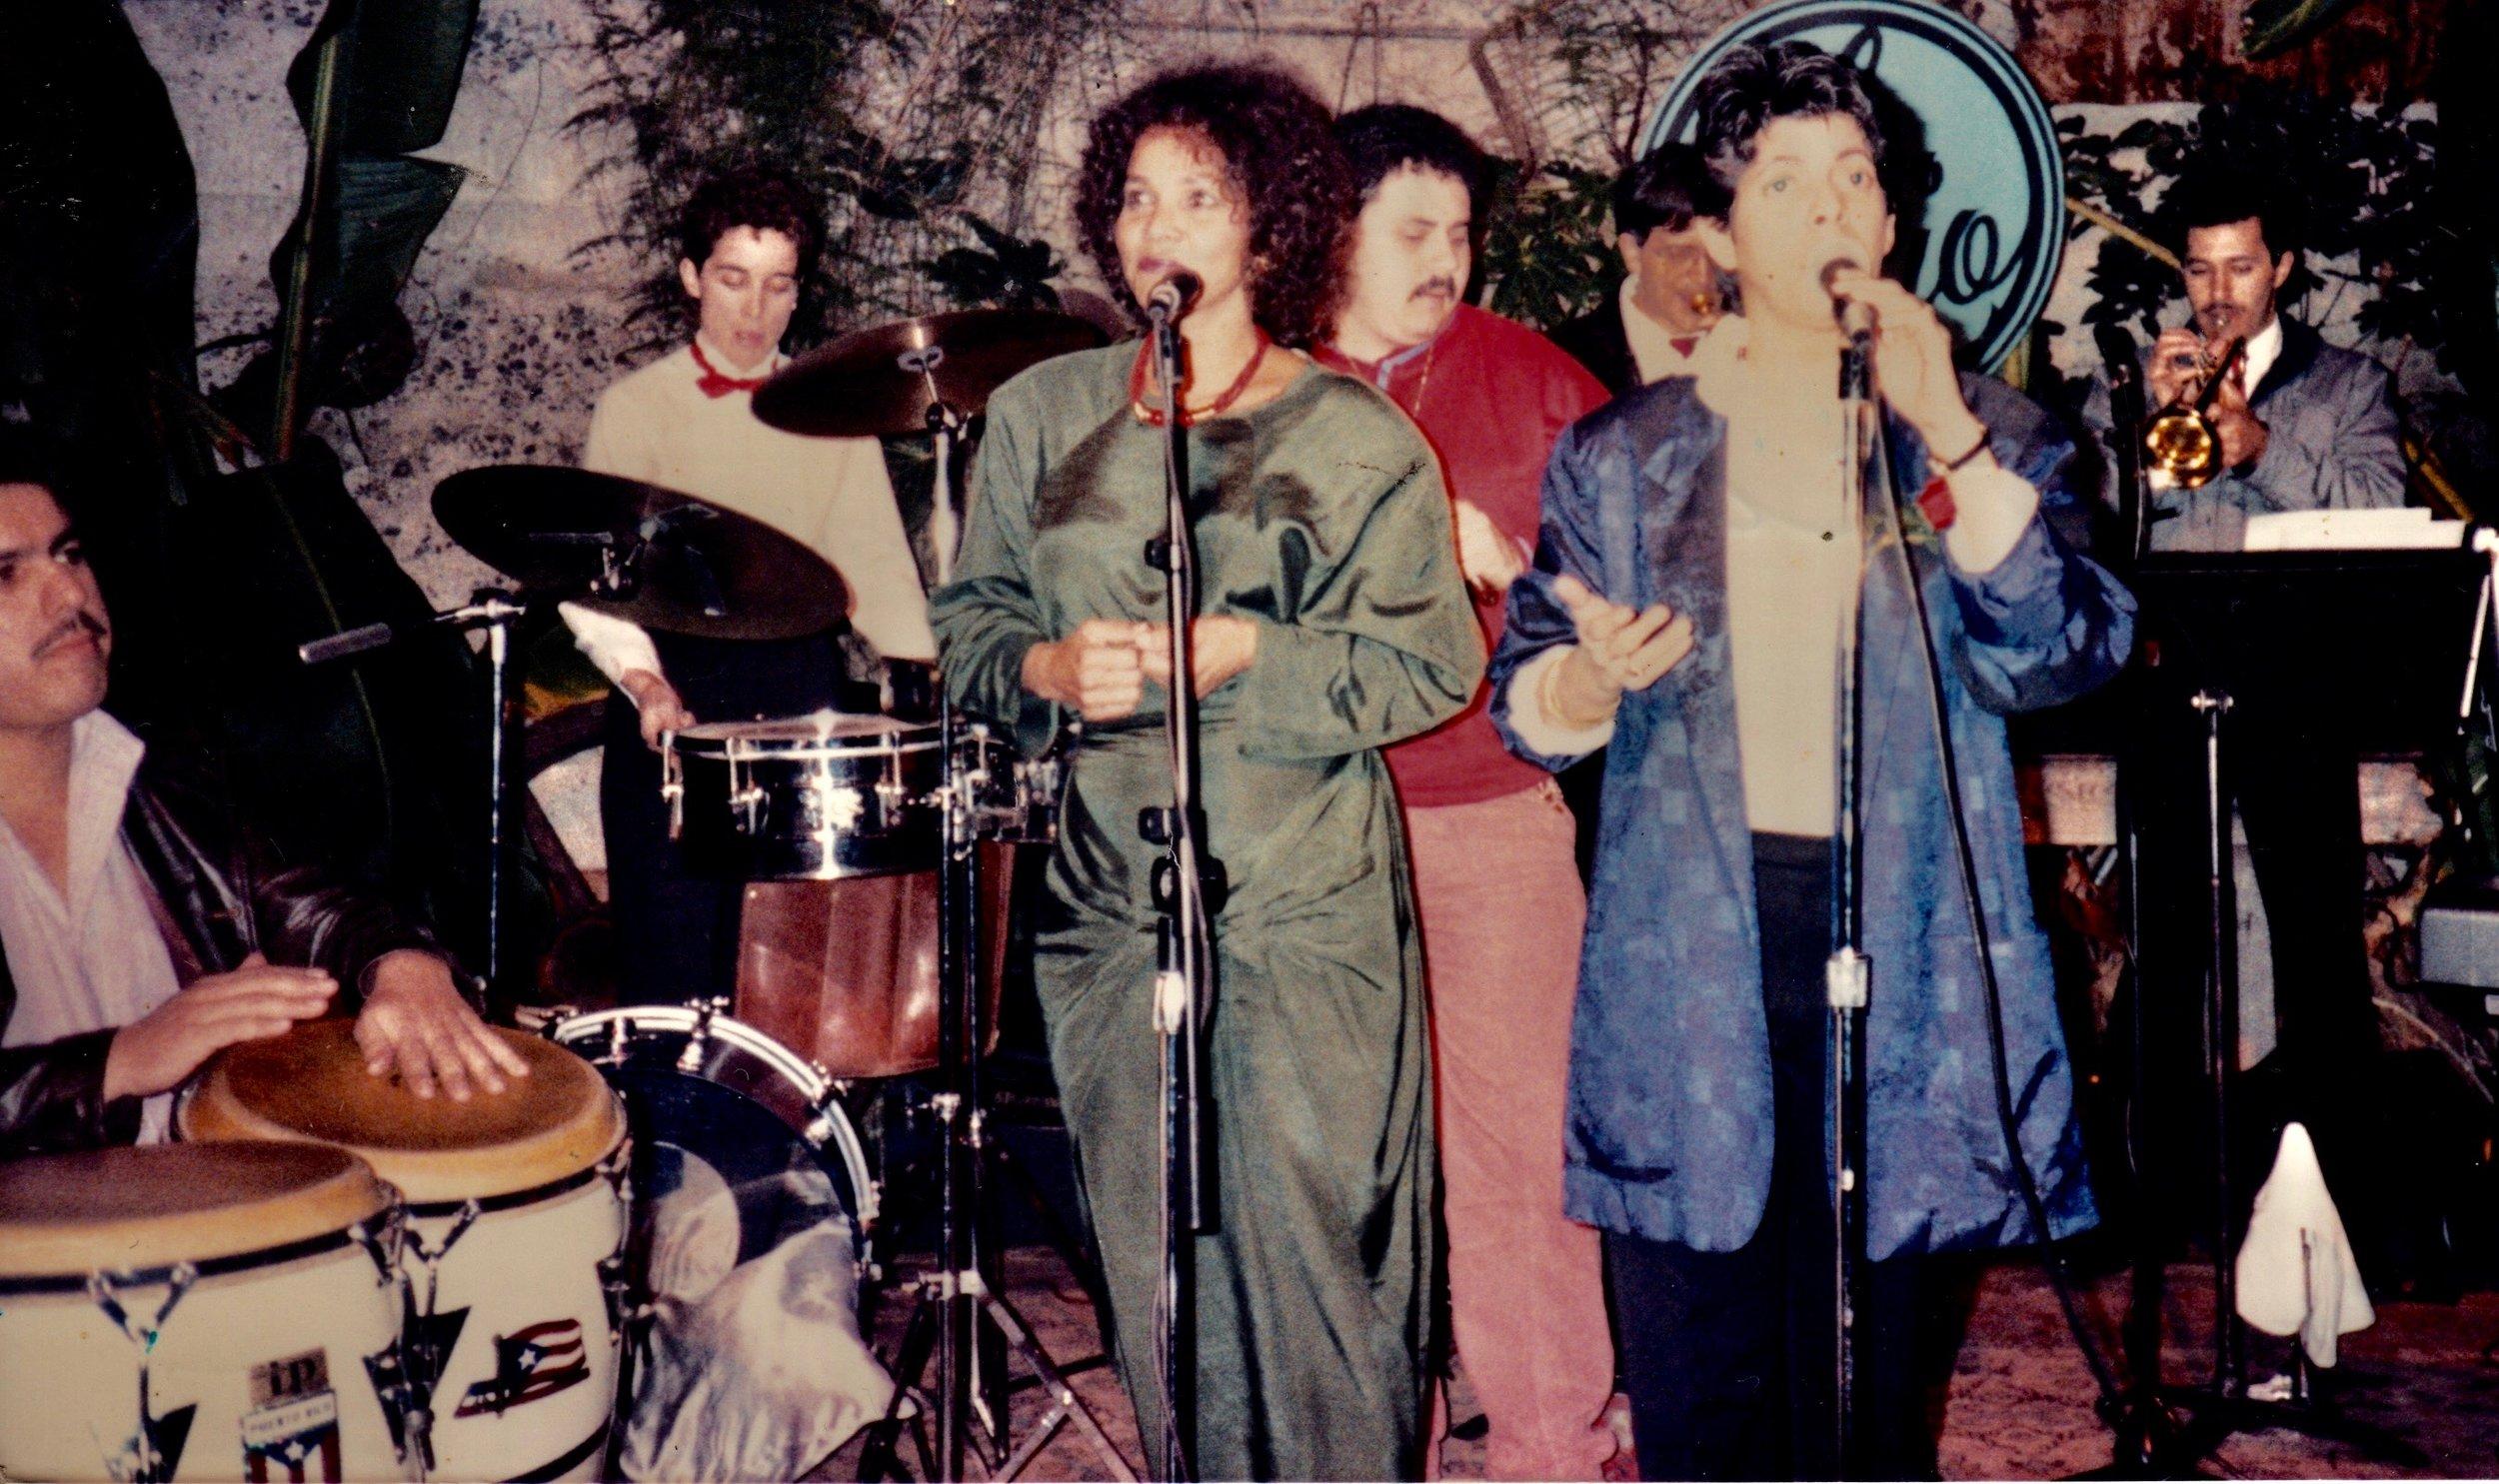 Sinigual San Francisco, CA 1988